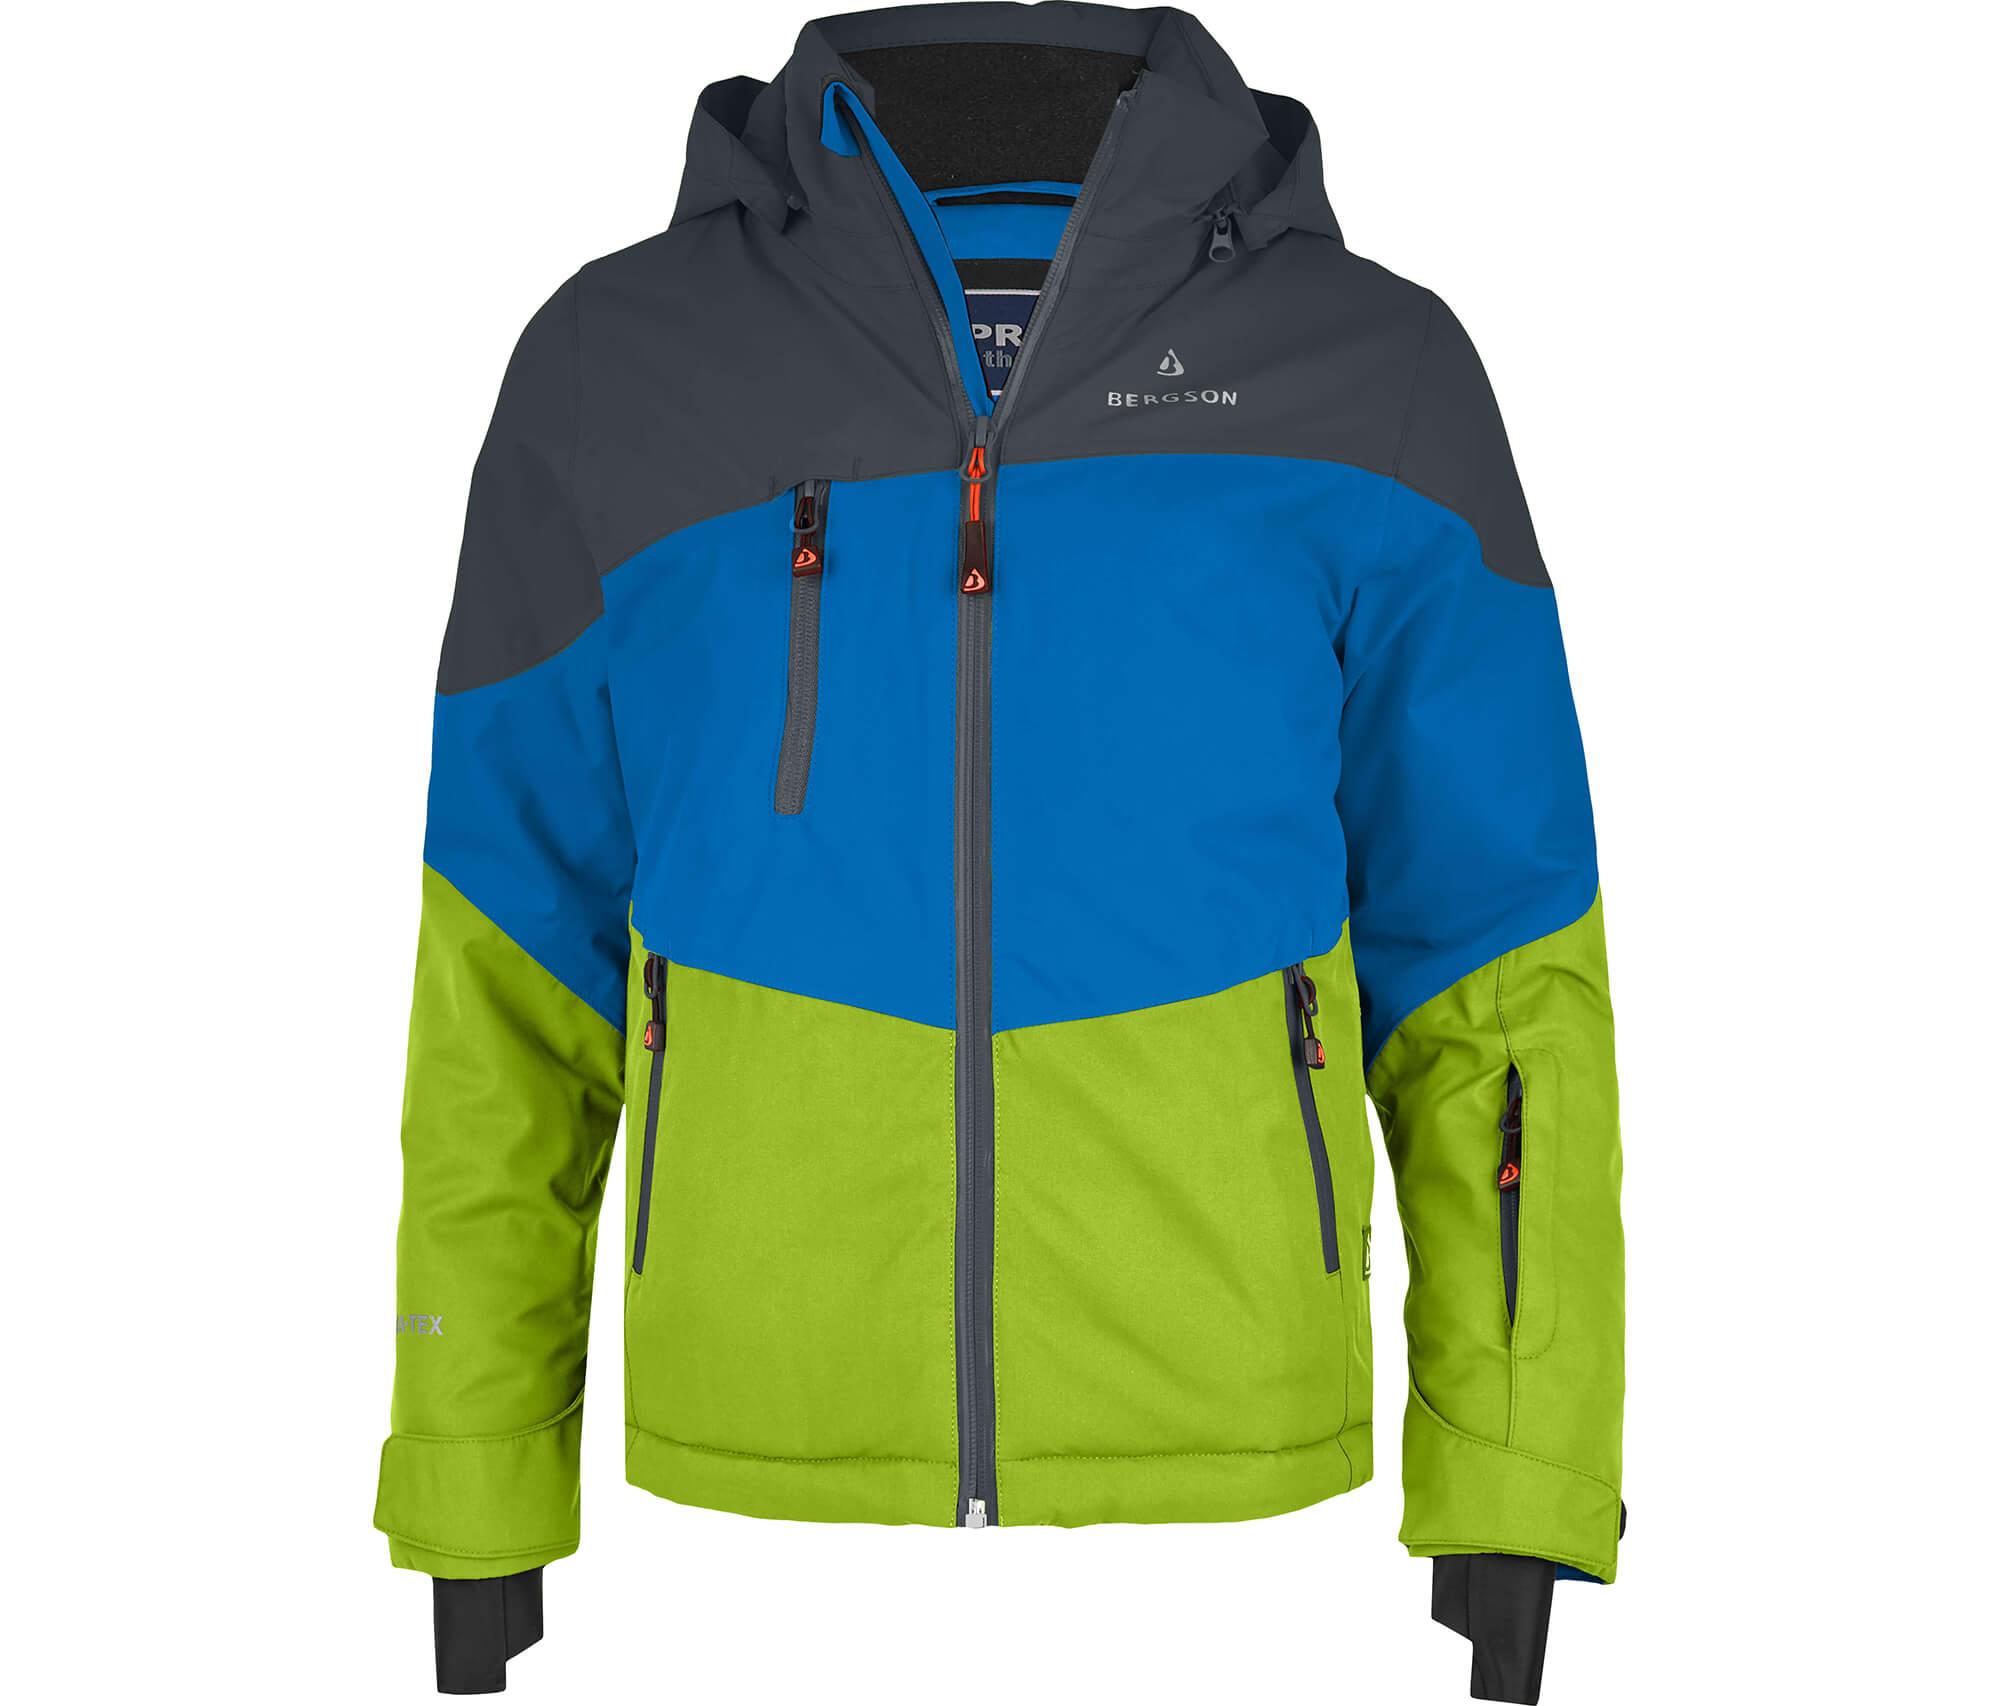 Bergson Kinder Skijacke VOLKER blau